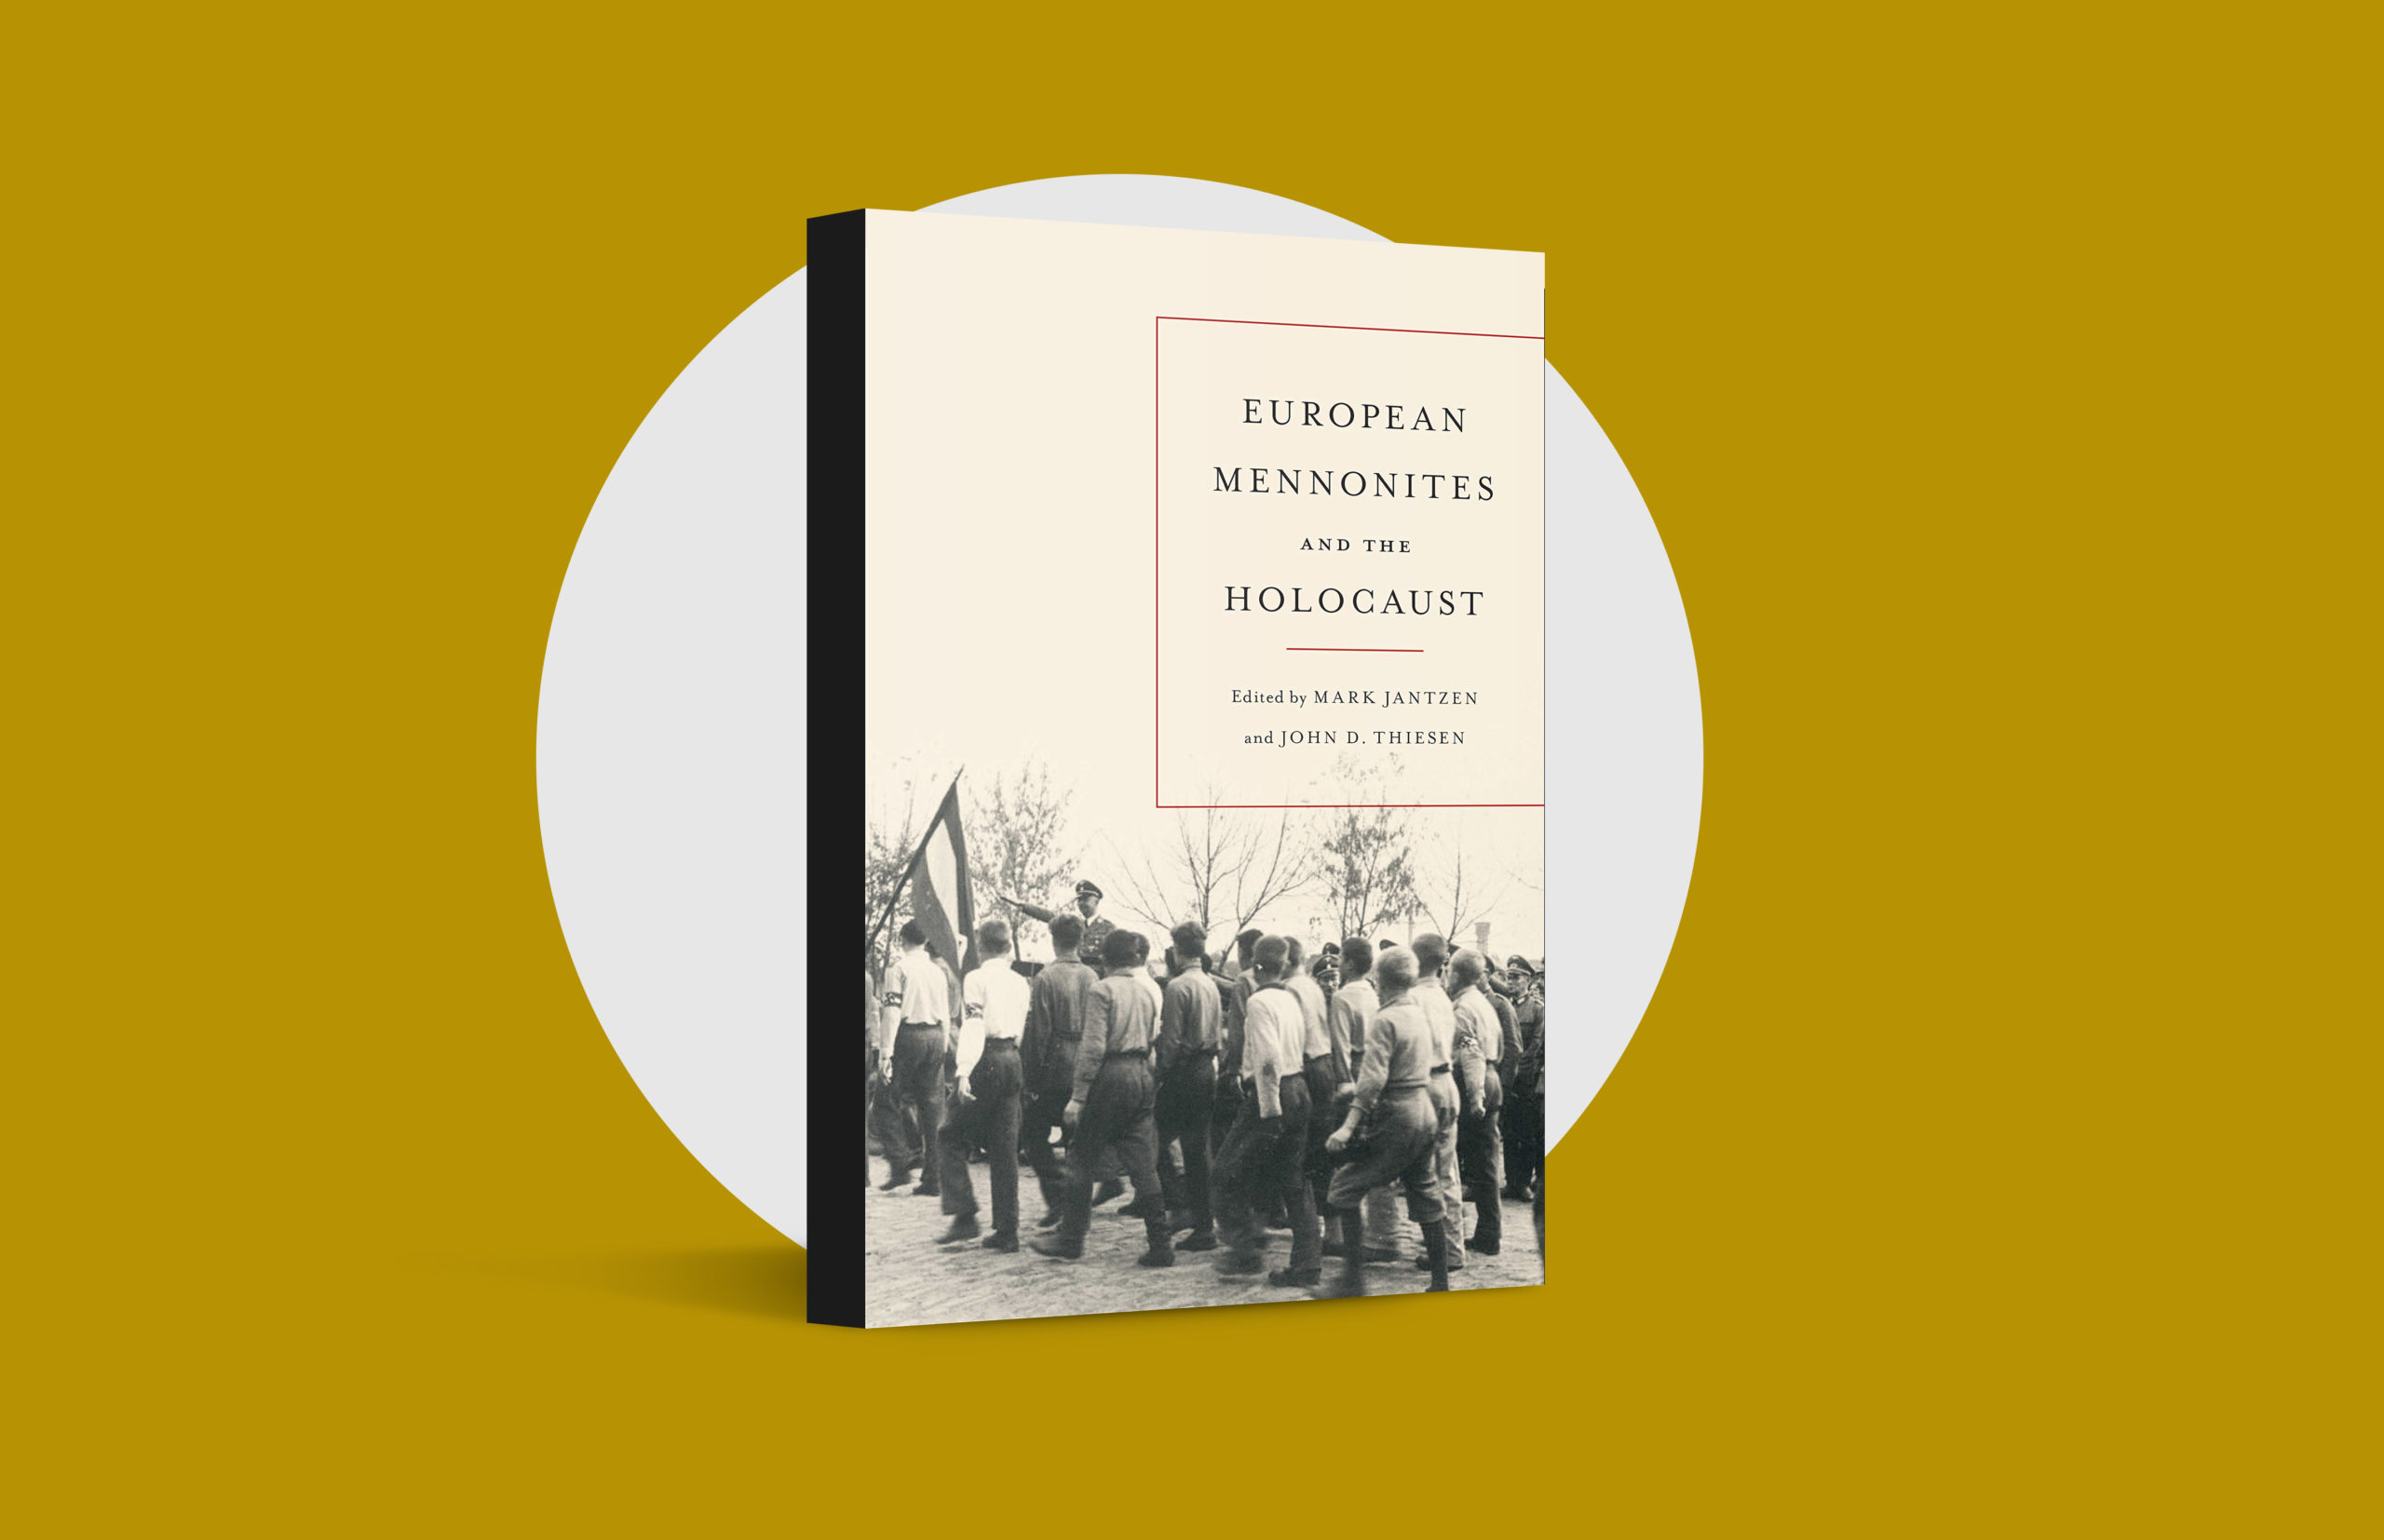 European Mennonites and the Holocaust, edited by Mark Jantzen and John D. Thiesen (University of Toronto Press, 2021)